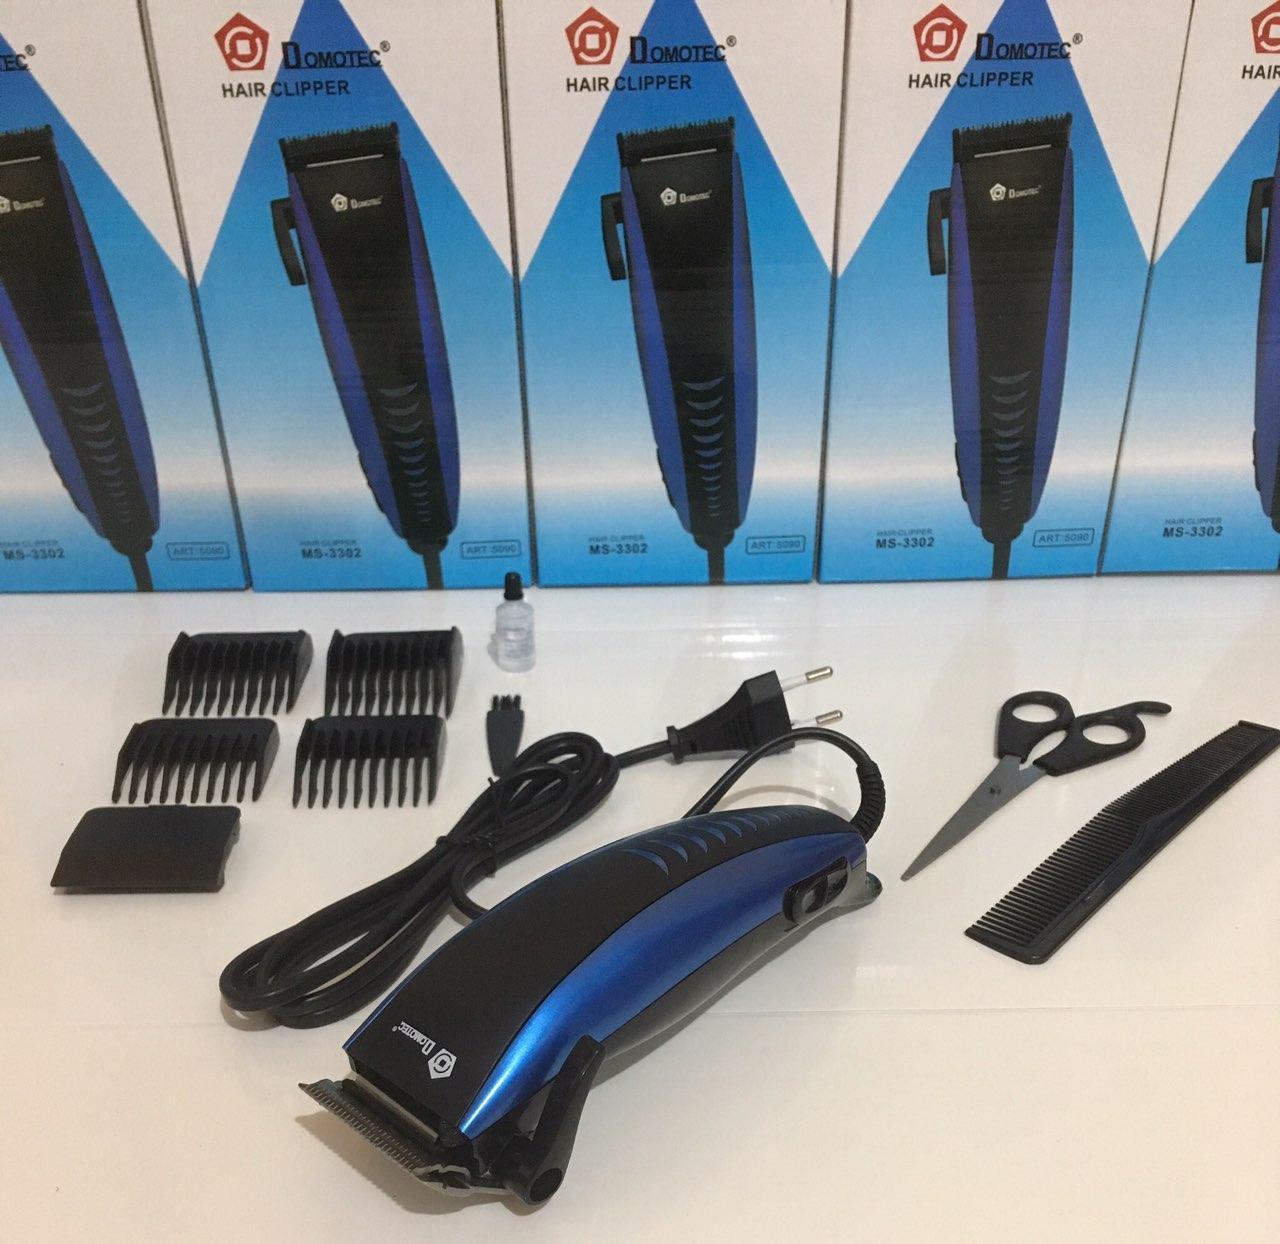 Машинки для стрижки волос DOMOTEC MS-3302 (24 шт)